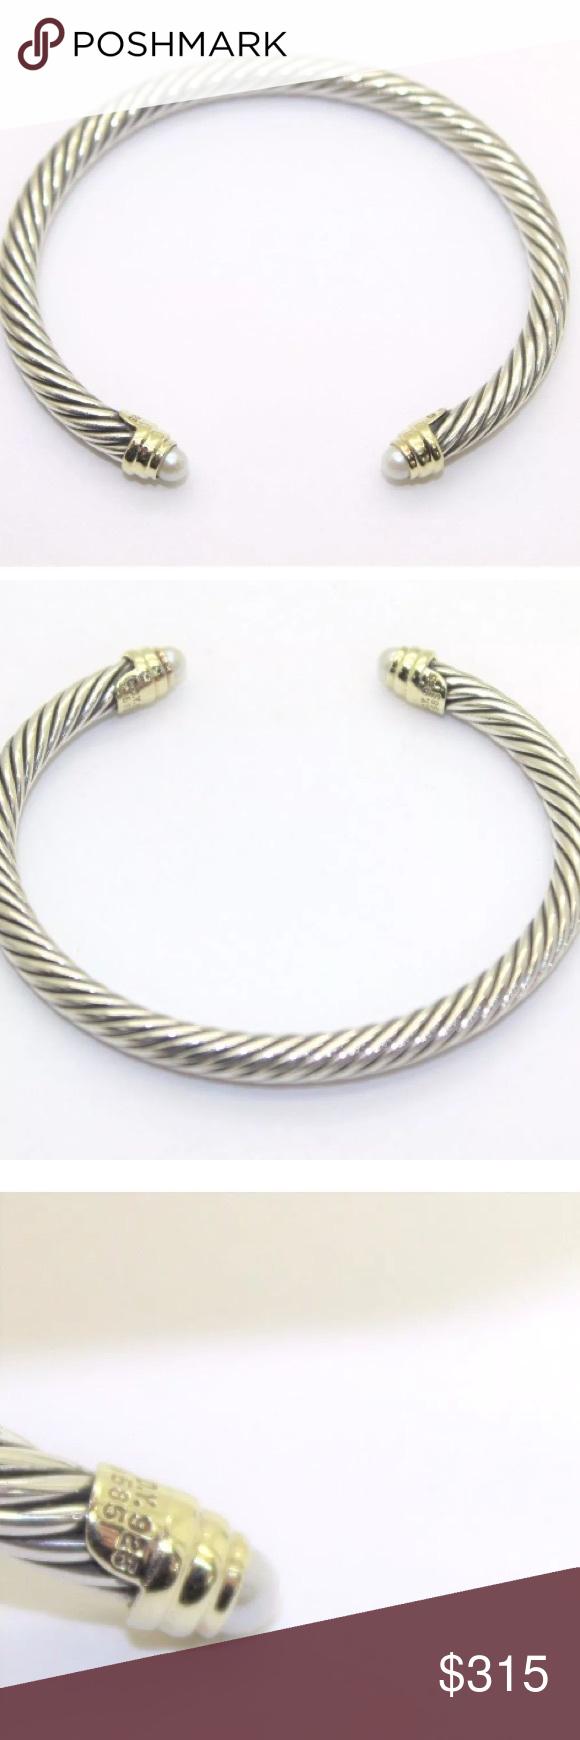 David Yurman 5mm Silver 14k Gold Pearl Bracelet Pearl Bracelet